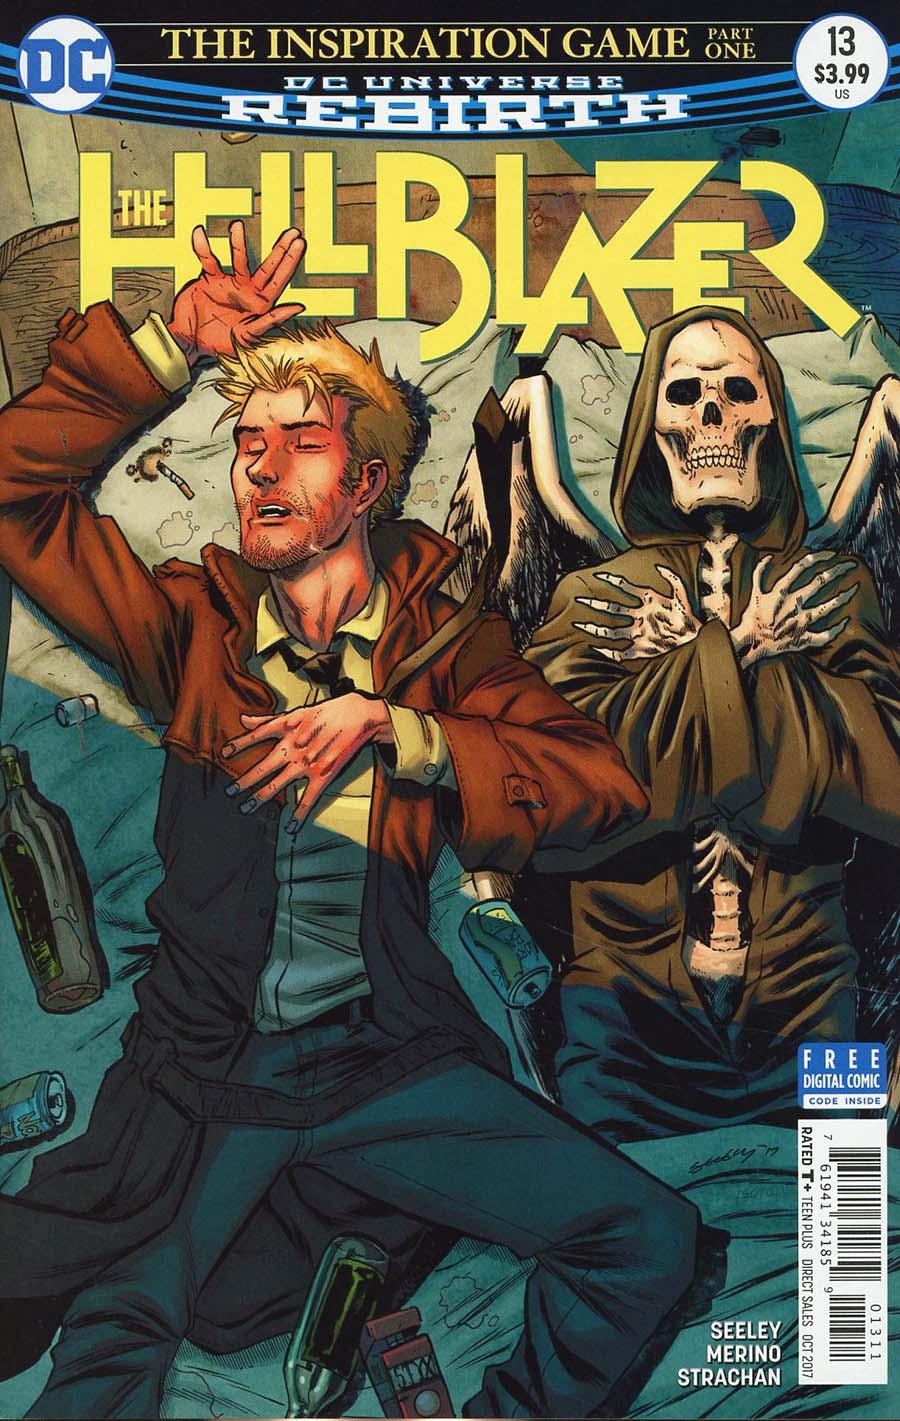 Hellblazer Vol 2 #13 Cover A Regular Tim Seeley Cover